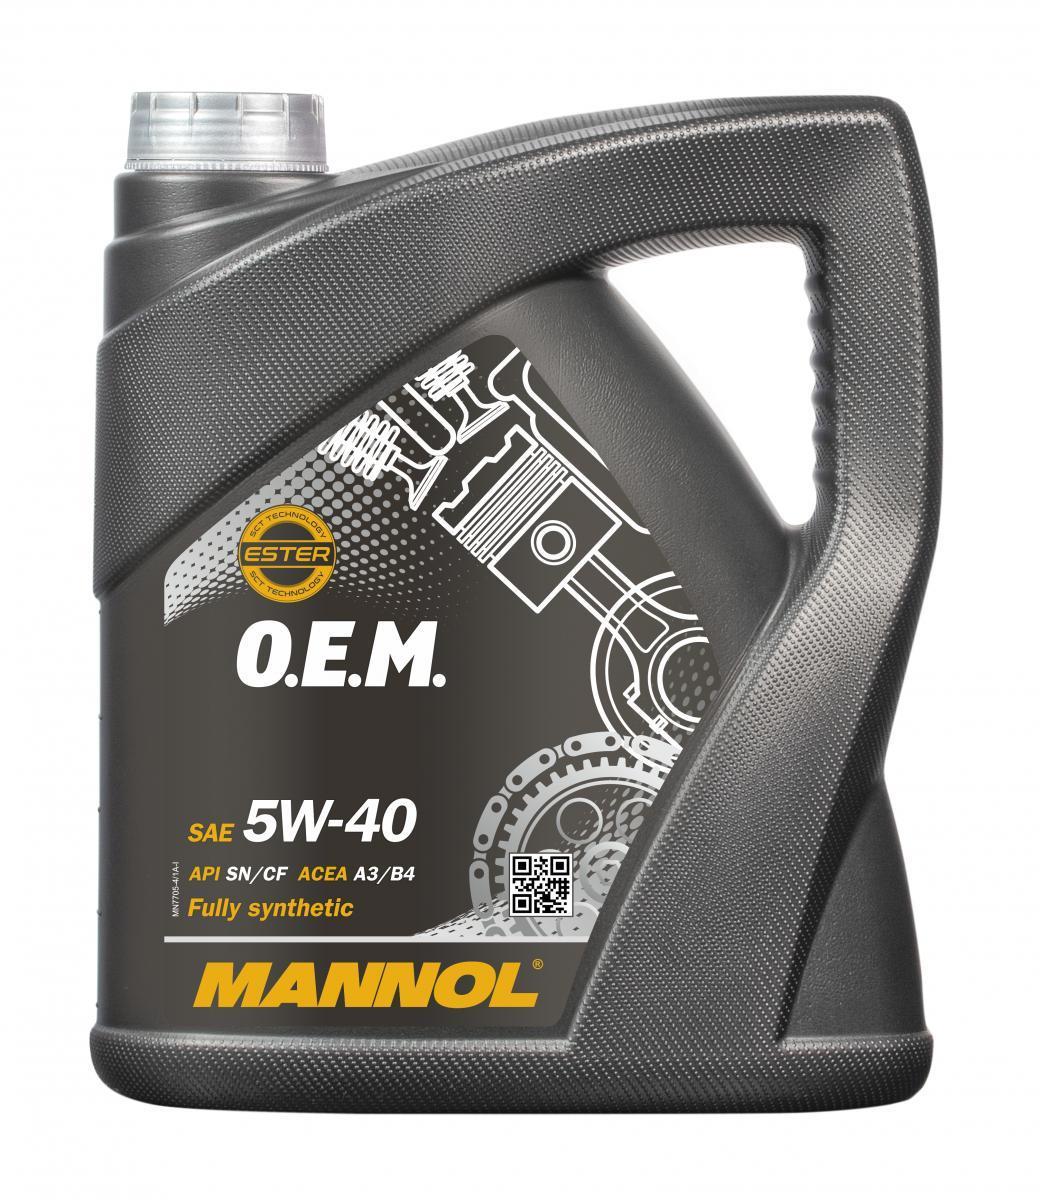 MANNOL O.E.M. MN7705-4 Engine Oil